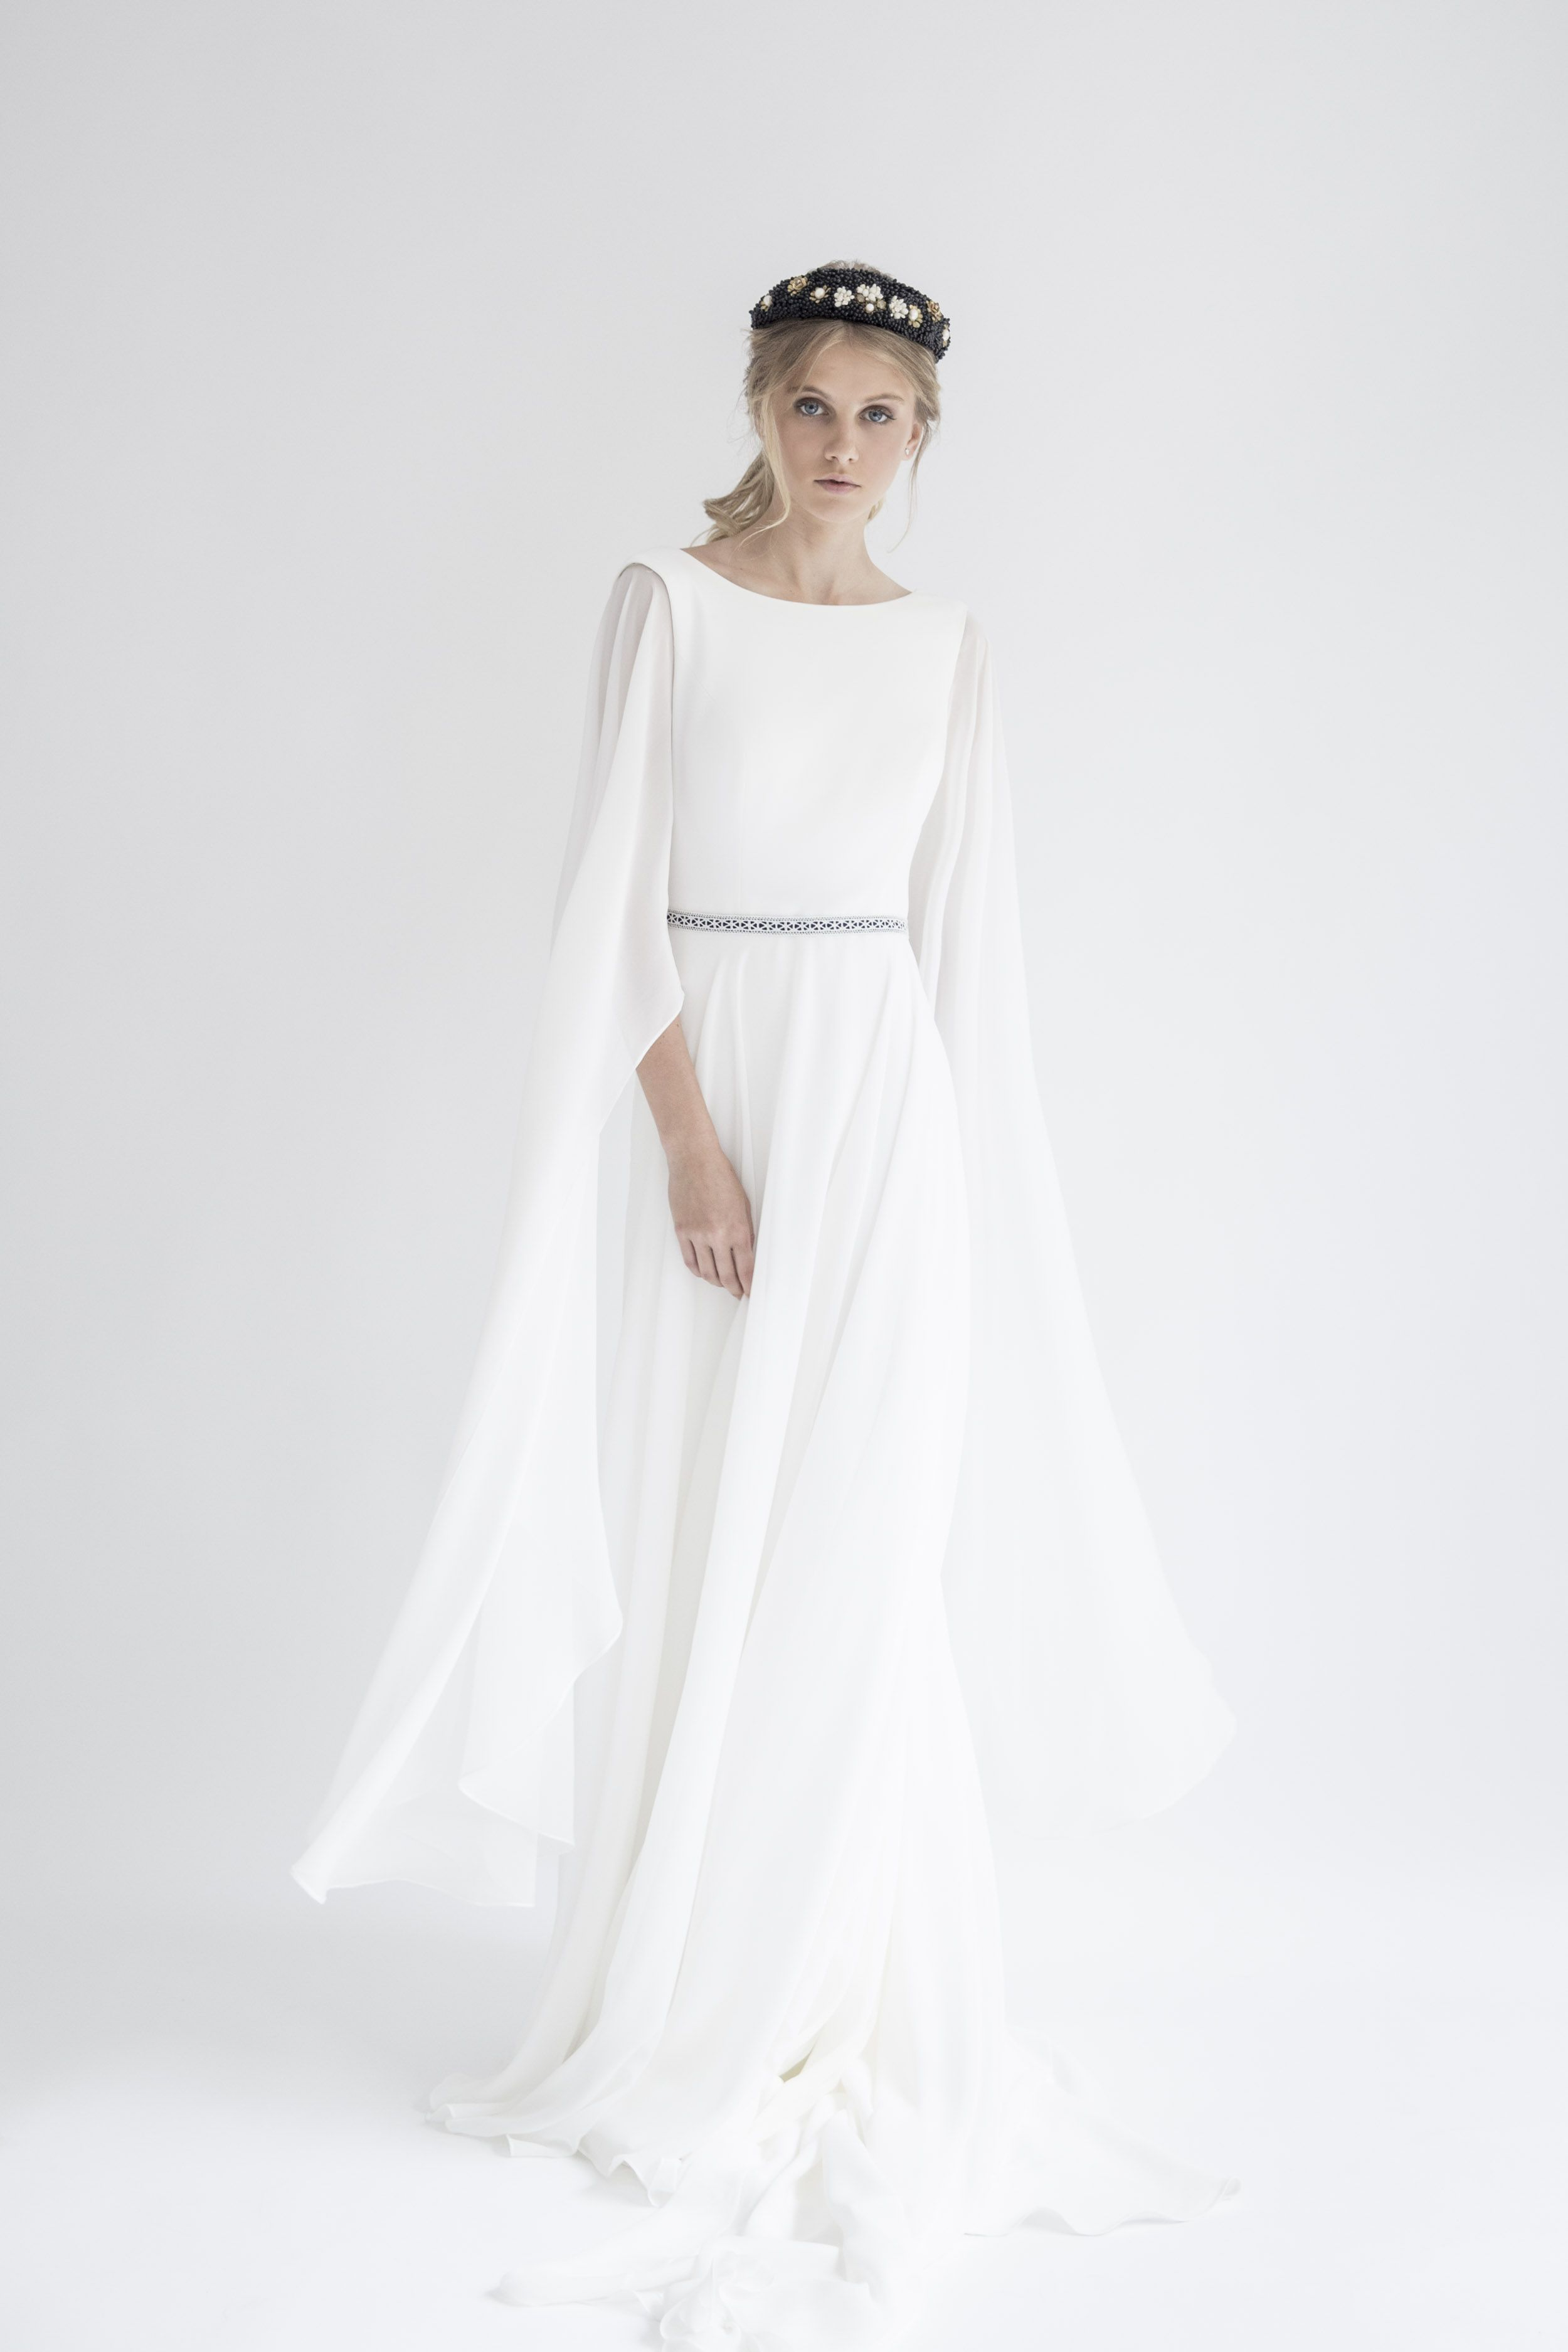 d7cf149a4 Vestido de novia de gasa de seda natural con manga larga campana. Detalle  de color